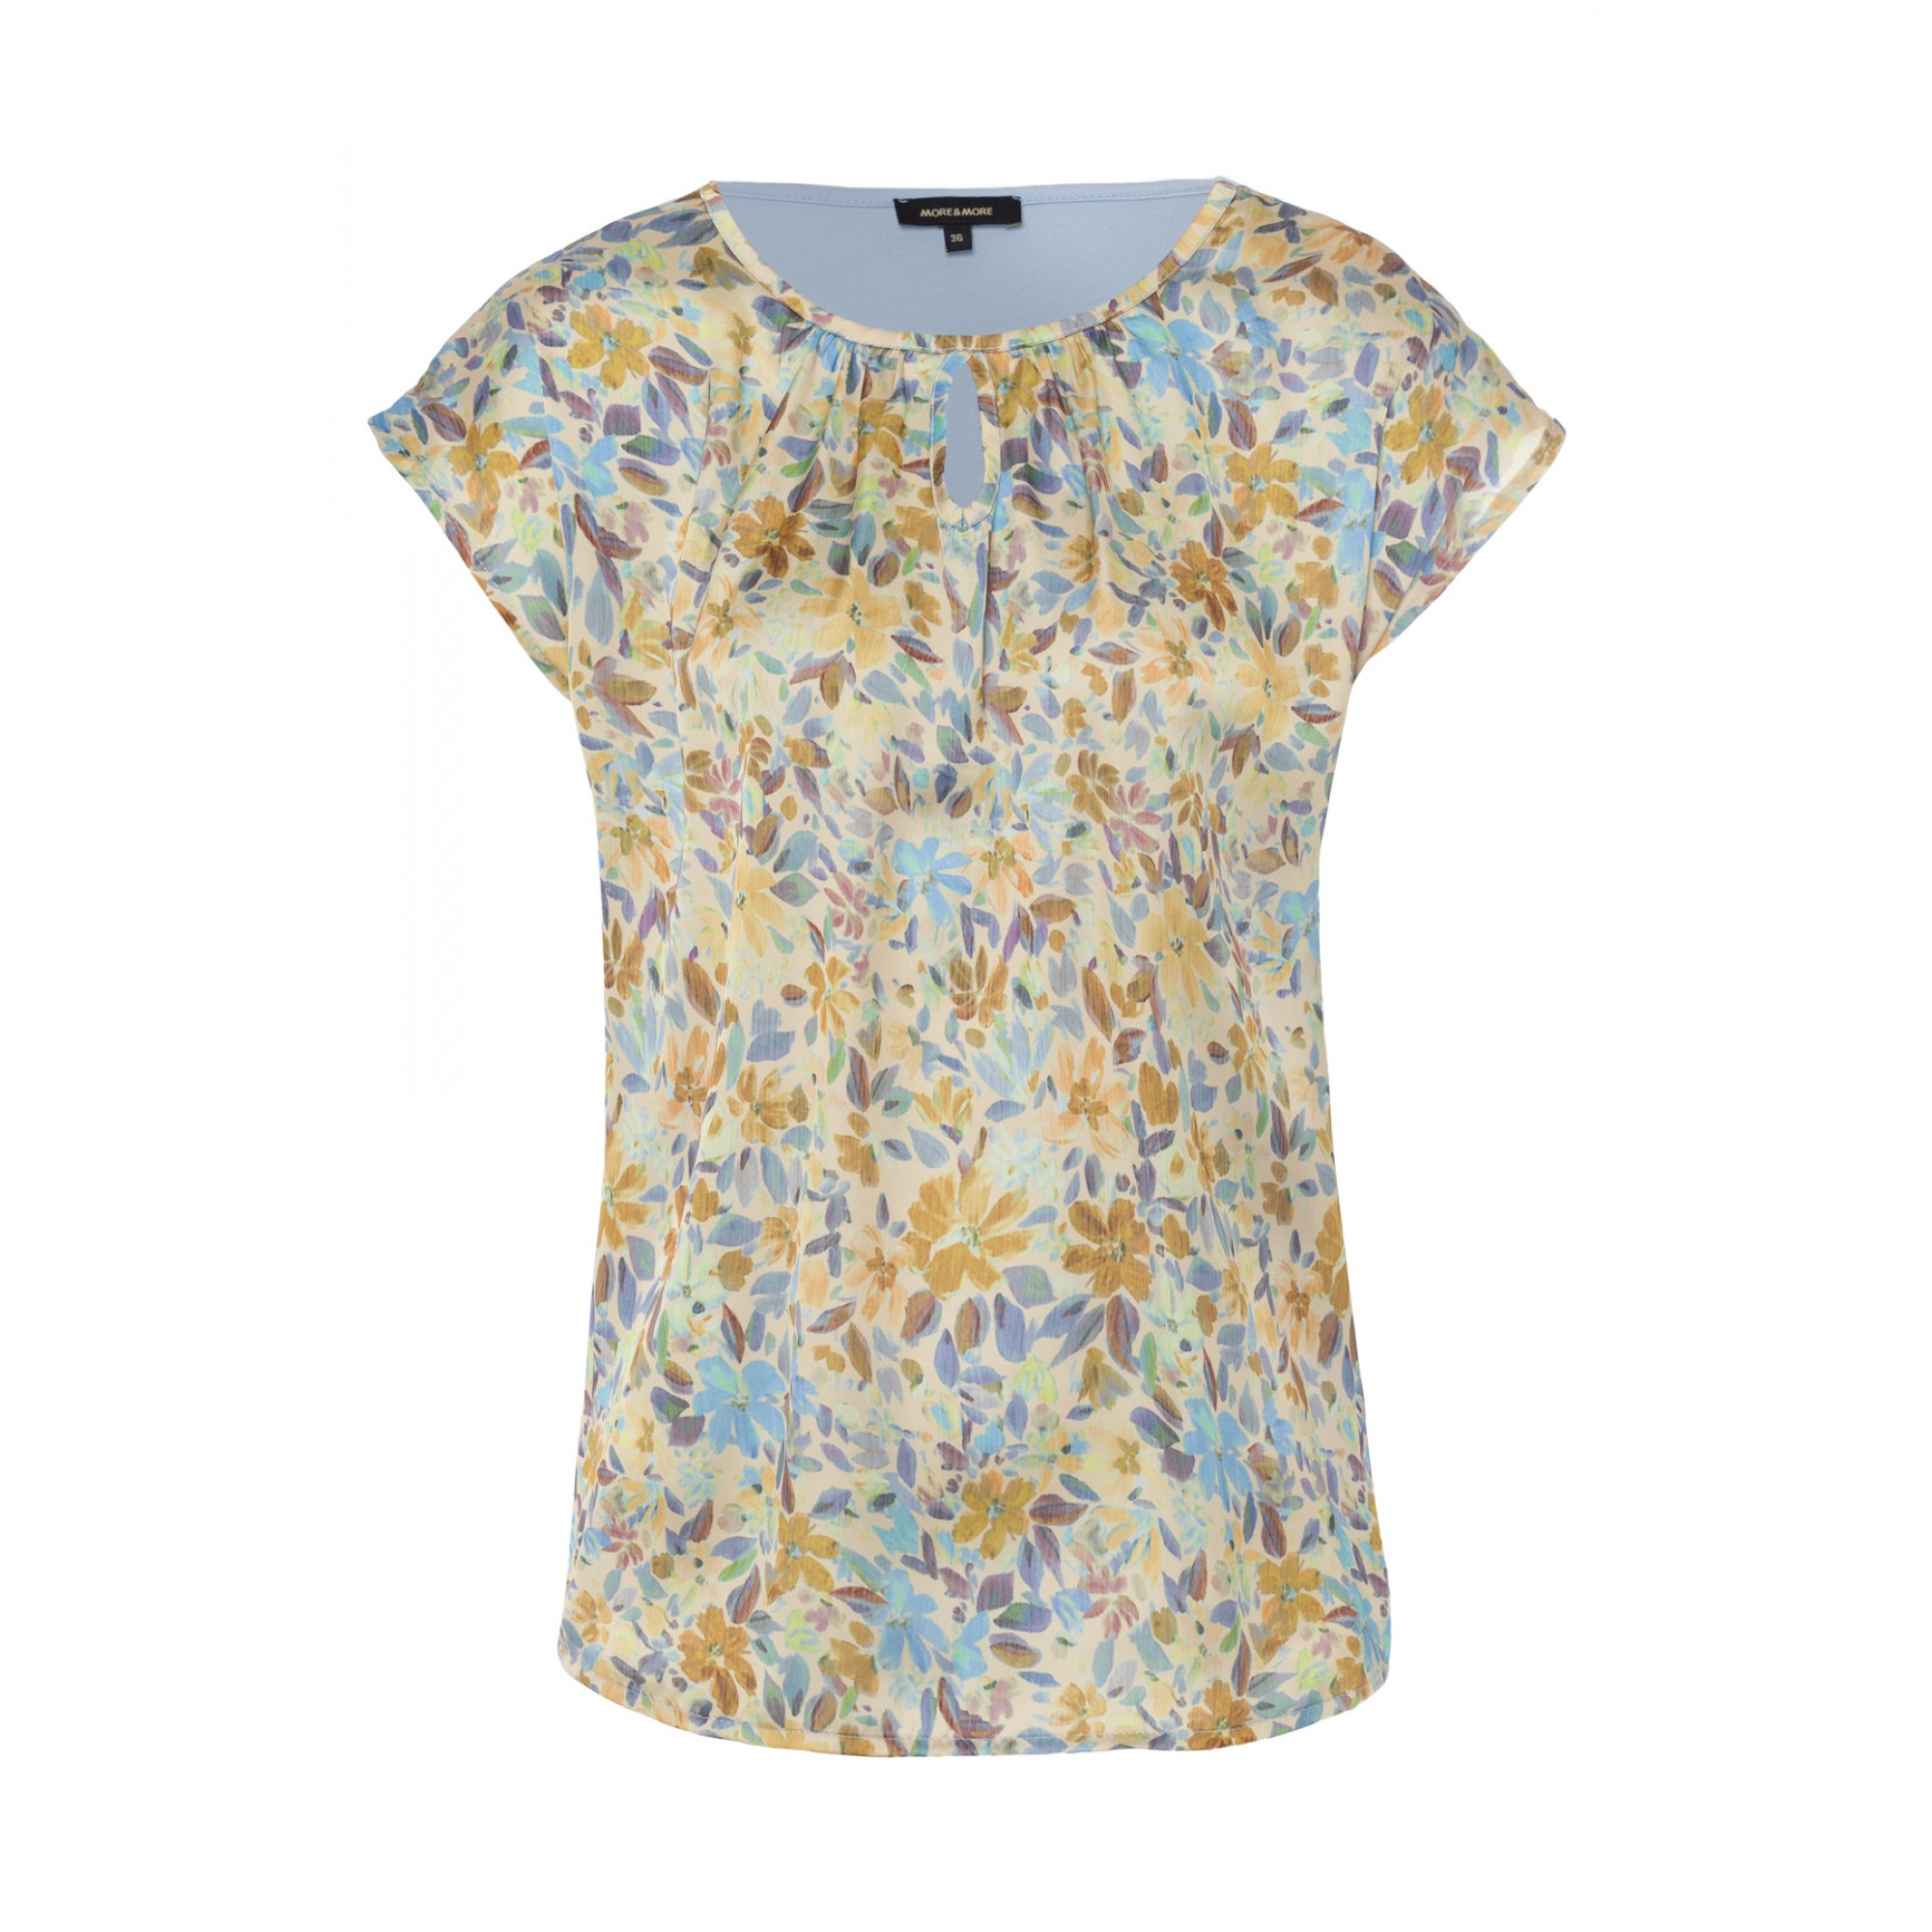 More & More kurzarm Blusenshirt mit floralem Muster beige